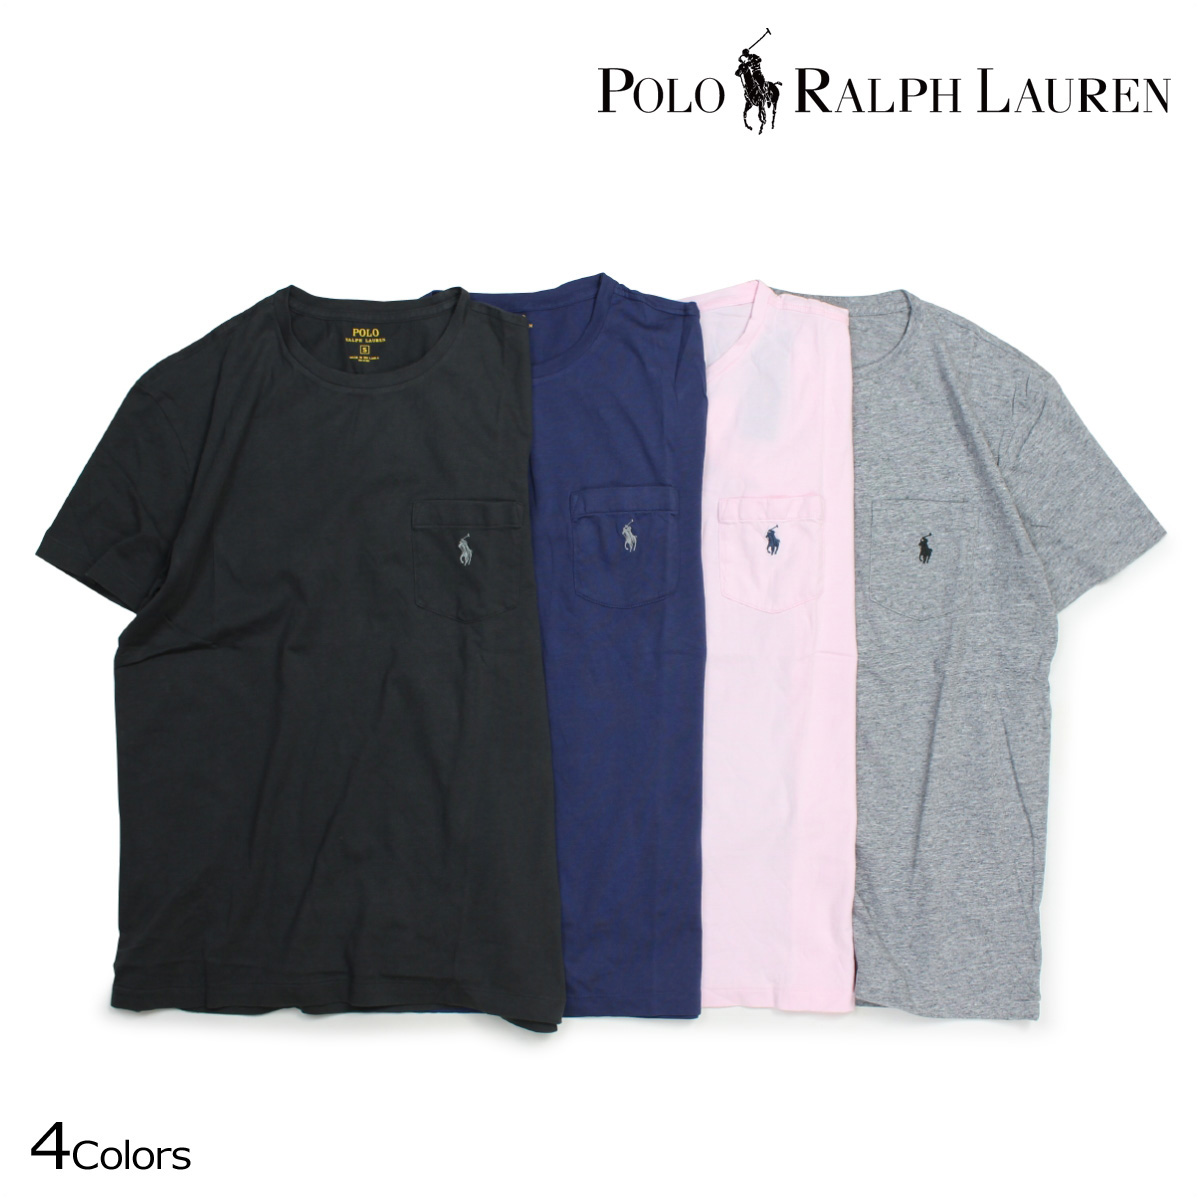 87b8c05ccfd ALLSPORTS  RALPH LAUREN T-shirt men short sleeves POLO Ralph Lauren U neck  polo T-shirt T-SHIRTS TEE 4 color  7 26 Shinnyu load   177